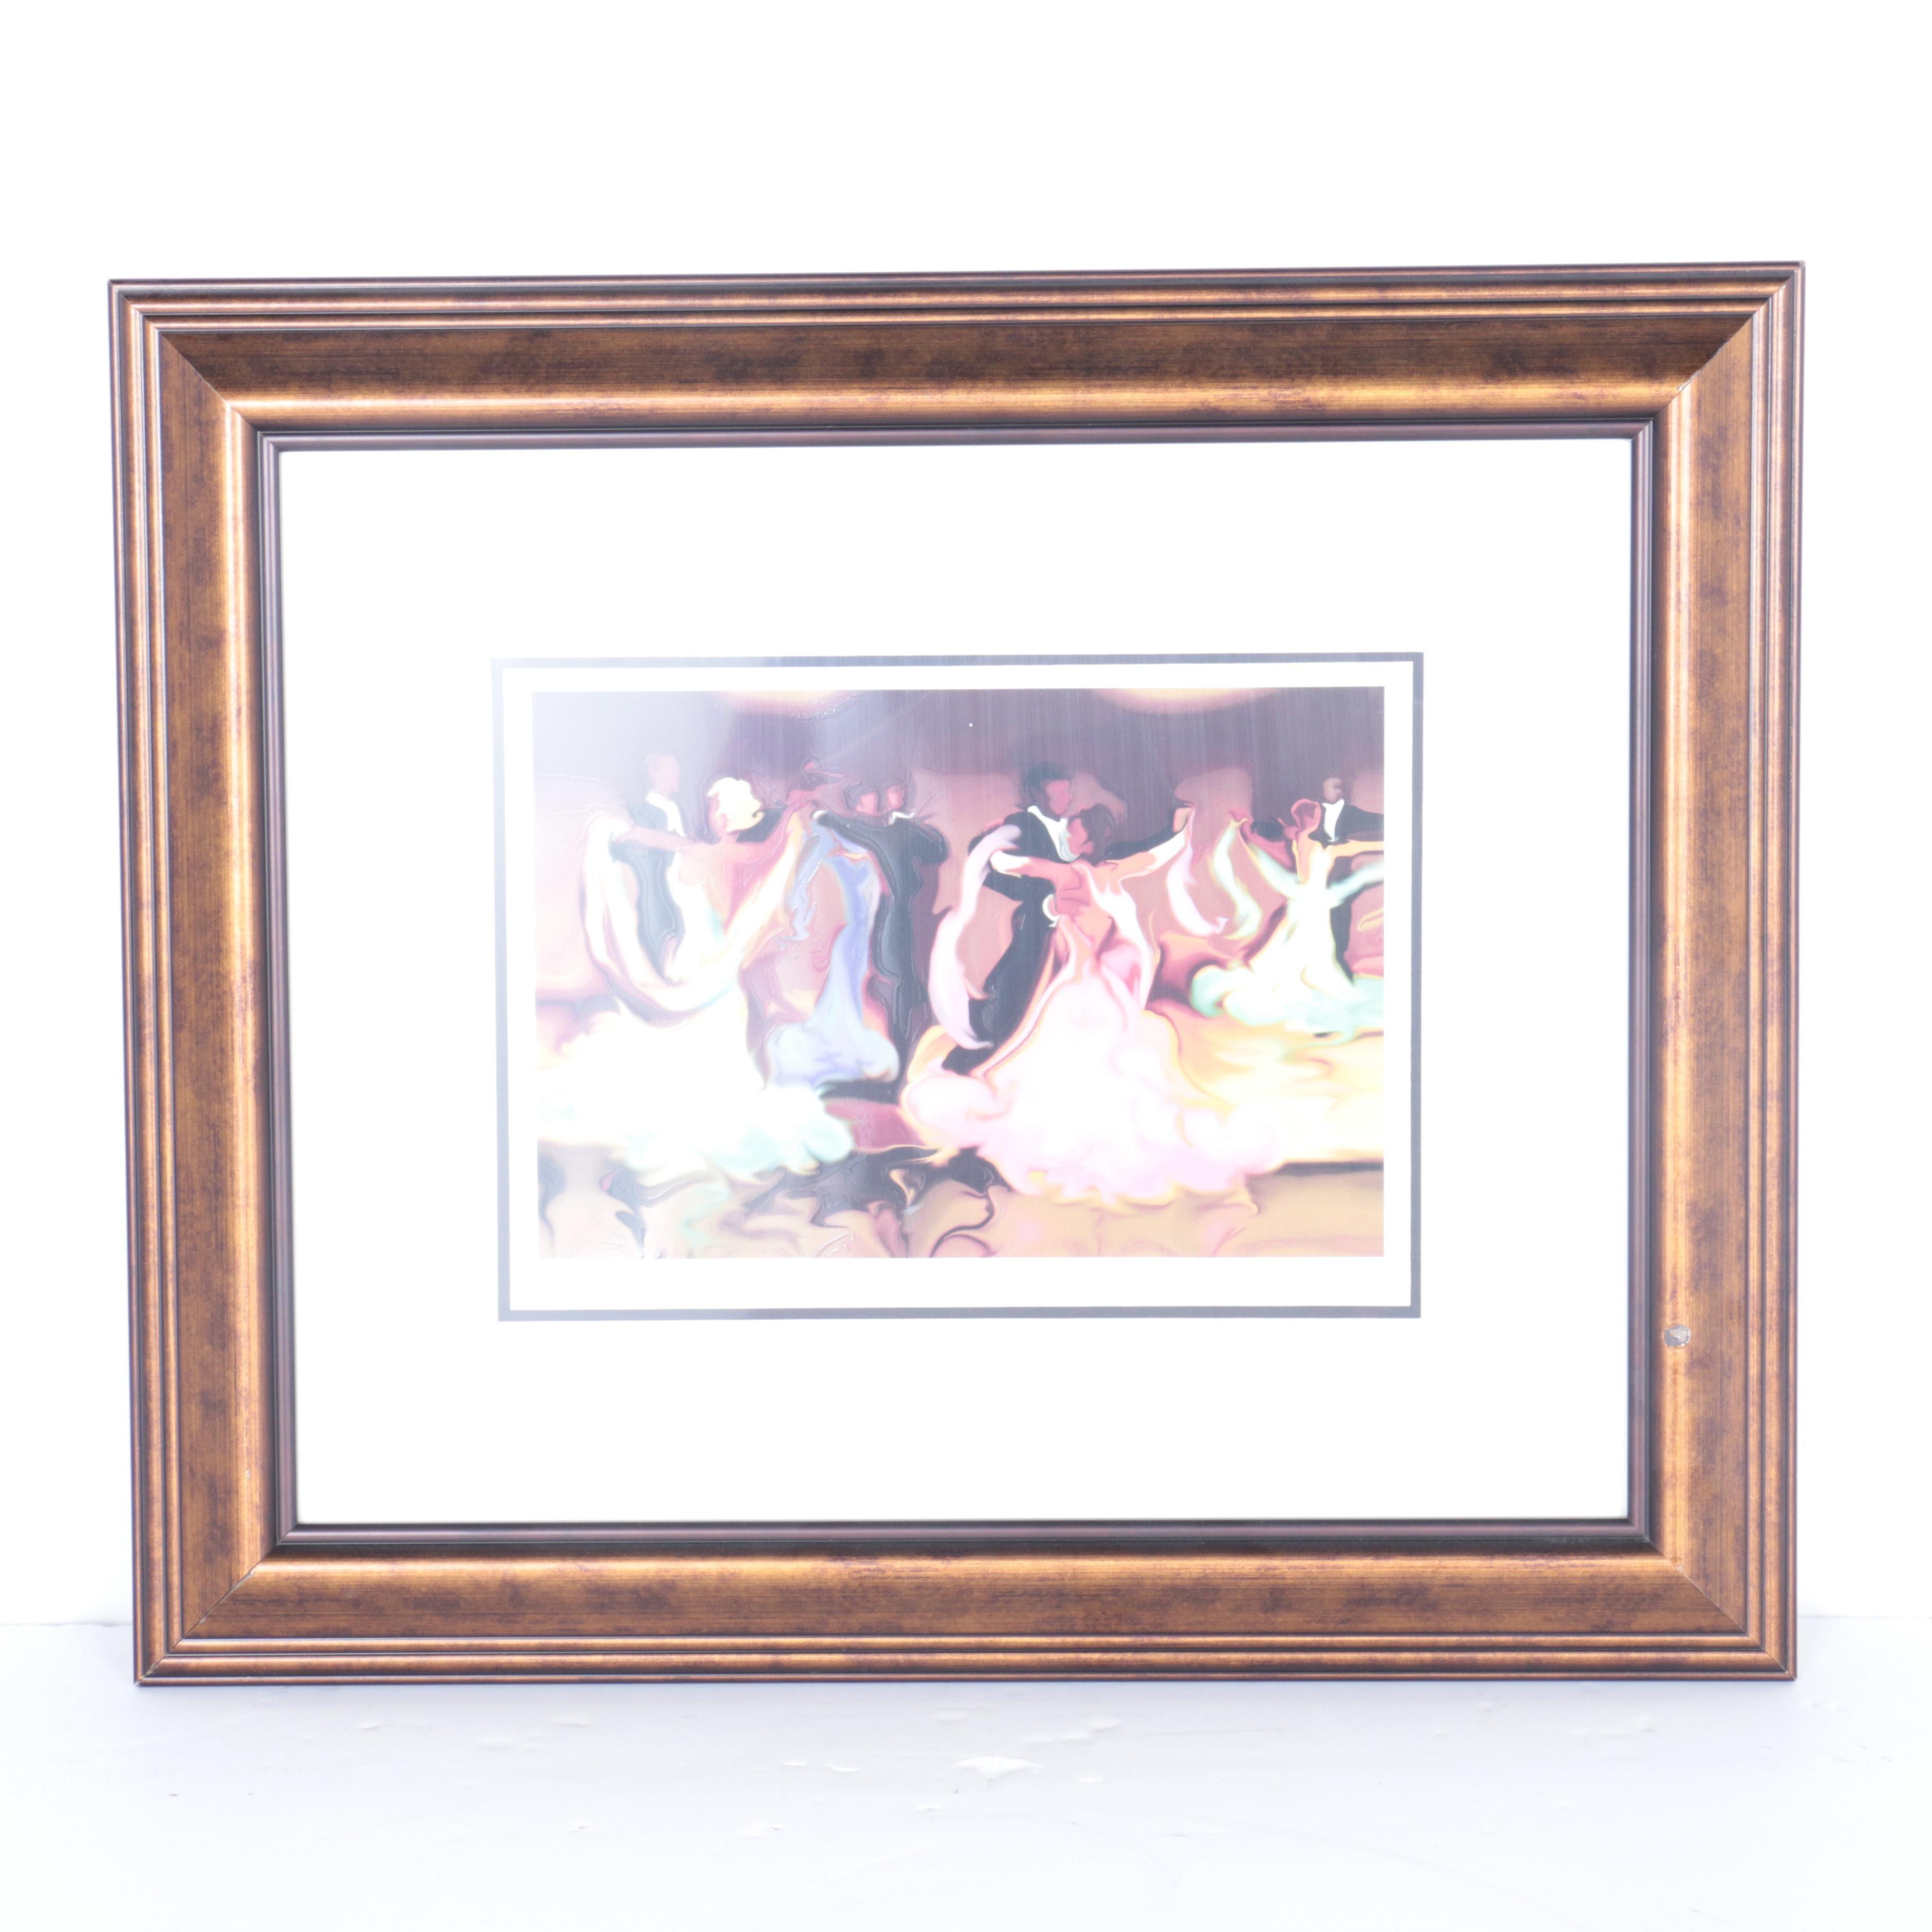 "Steve Bloom Limited Edition Serigraph on Paper ""Ballroom"""